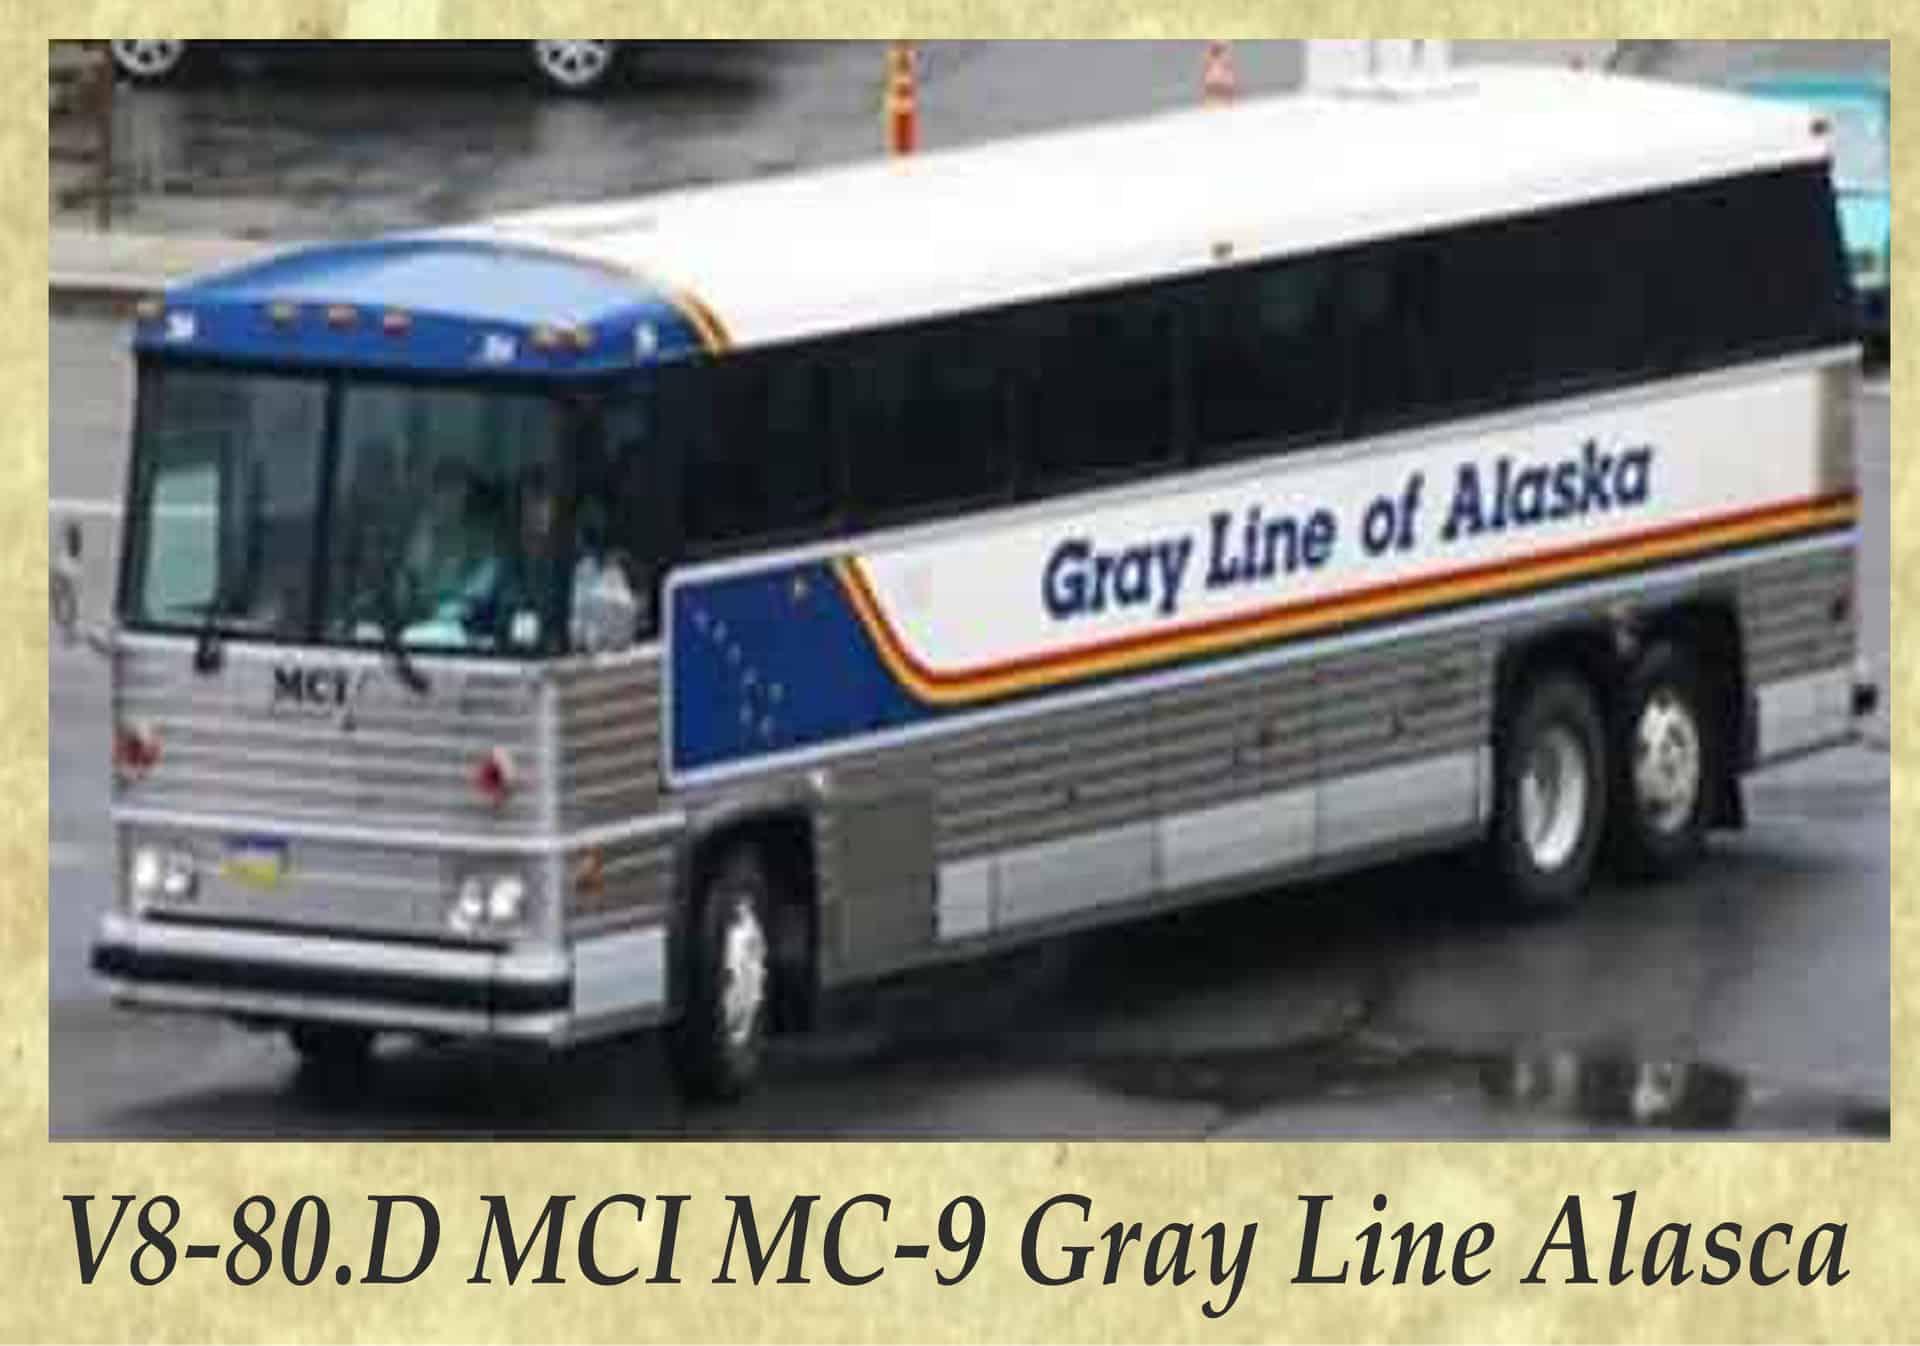 V8-80.D MCI MC-9 Gray Line Alasca